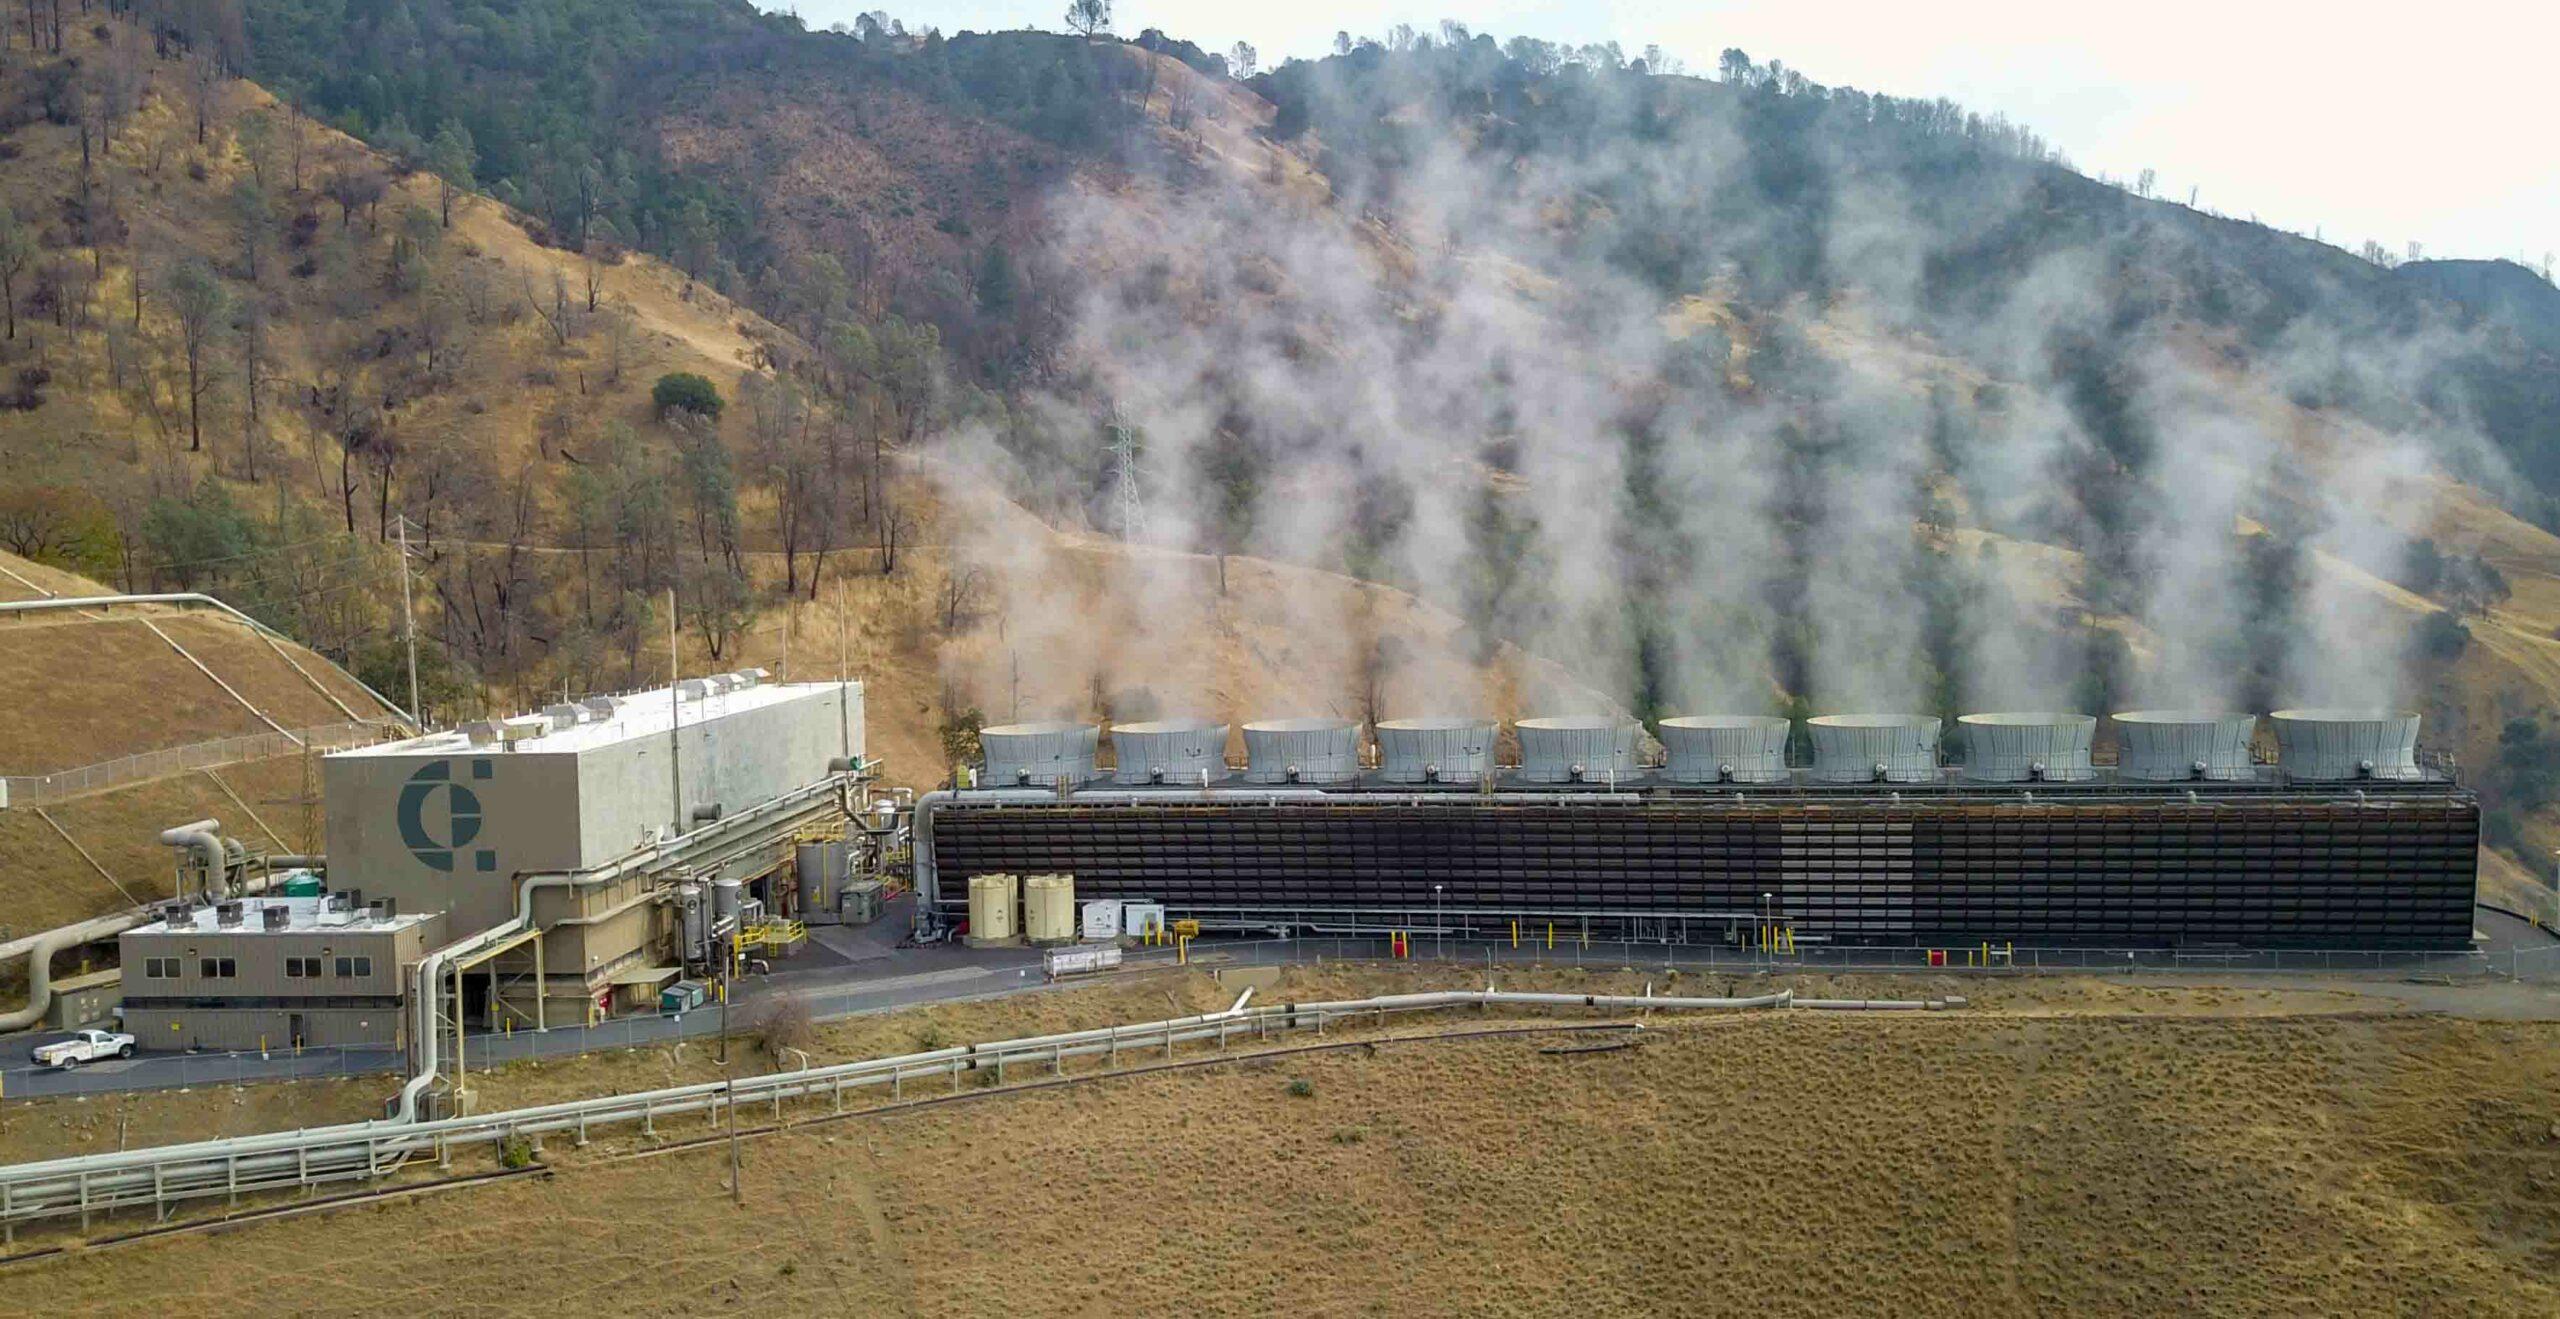 McCabe U5-6  (photo courtesy Calpine Corporation & Geysers Power Company, LLC.